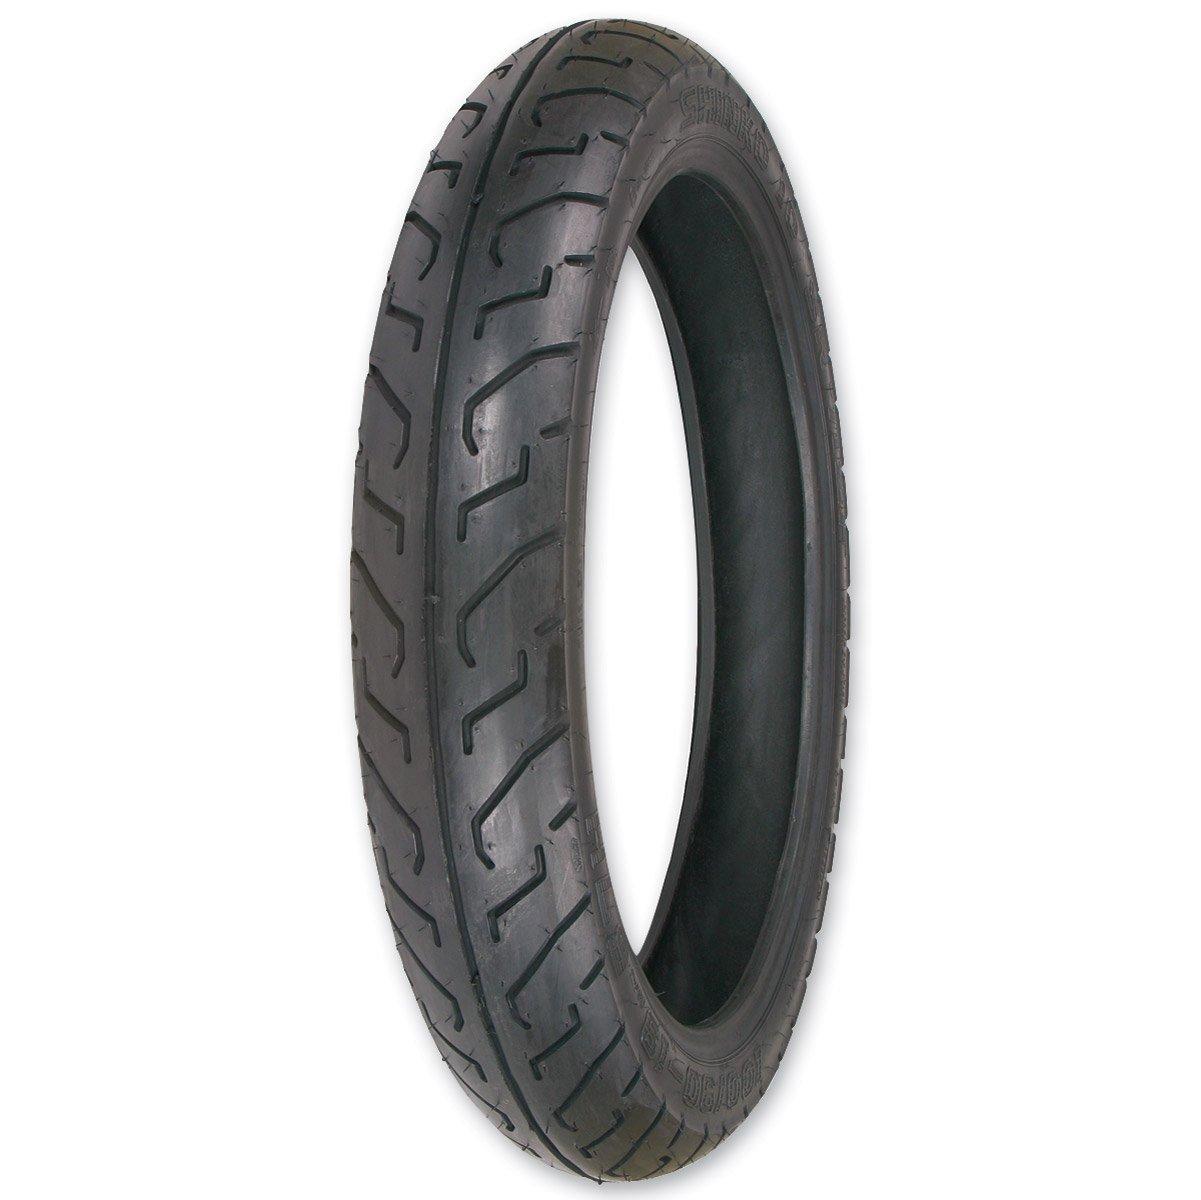 Shinko 712 Front Tire (100/90-18) 4333046480 87-4140-MPR2